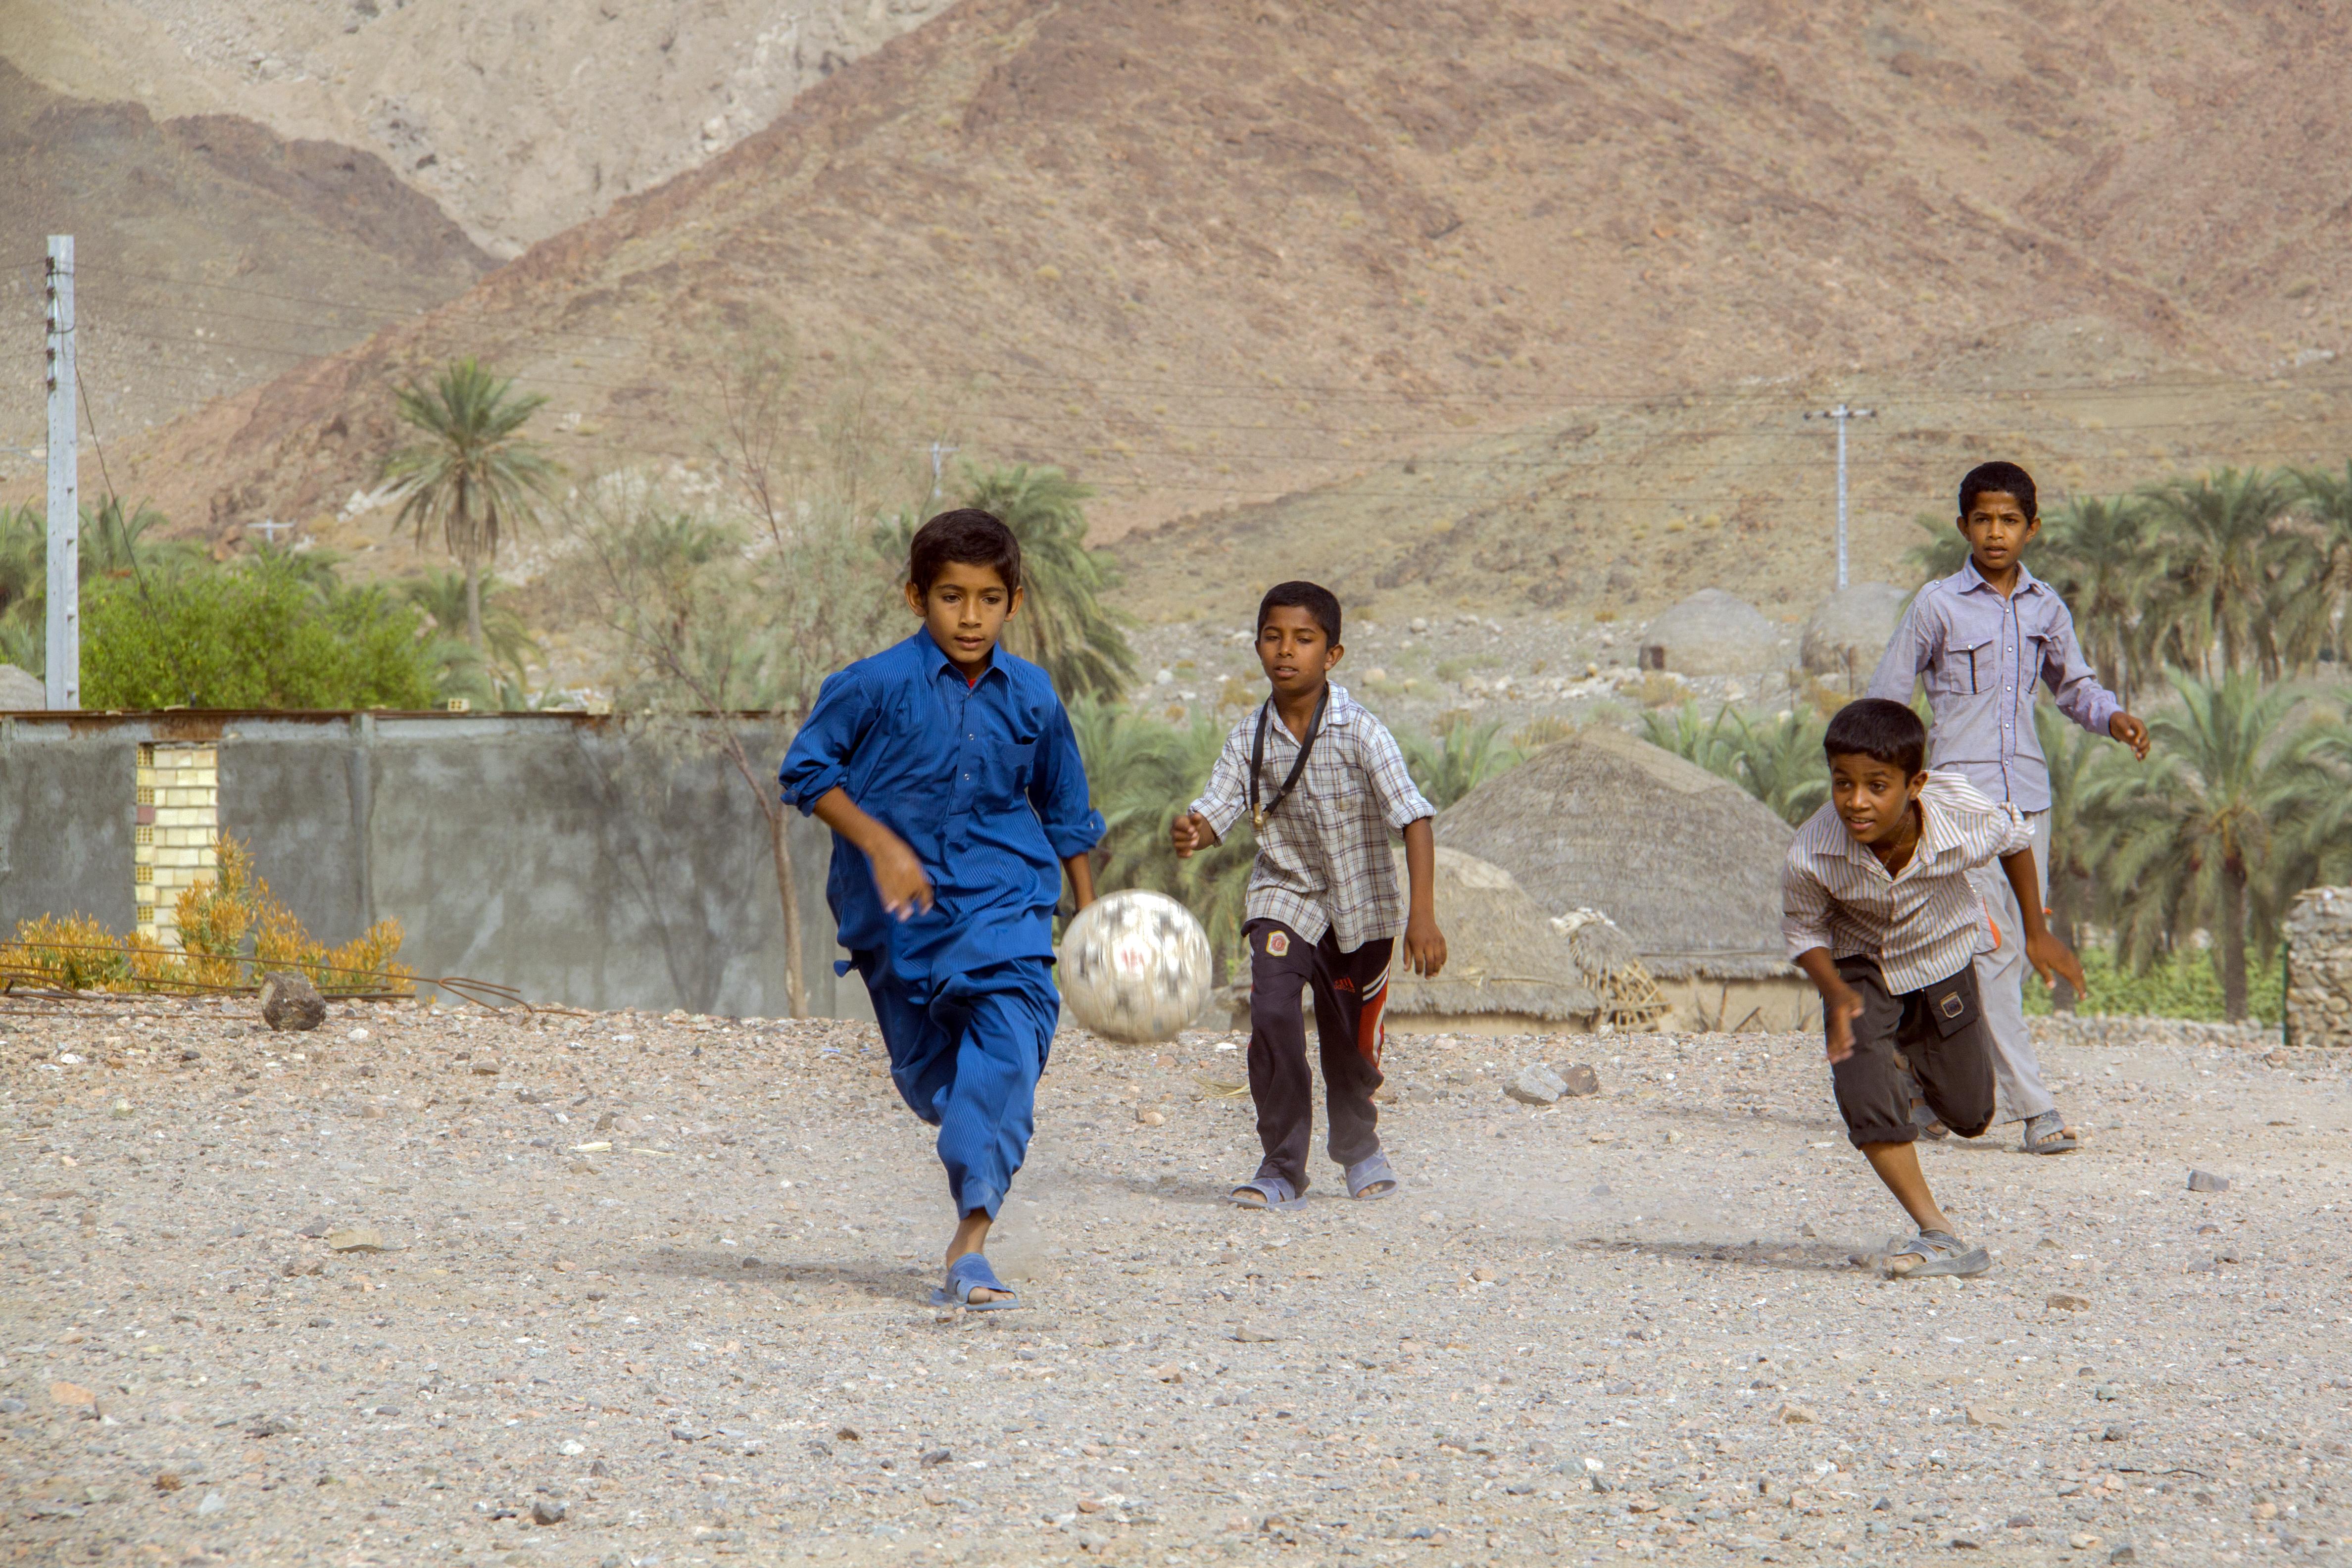 Beach Soccer Worldwide. Bahasa Indonesia: Sepak bola pantai atau beasal, adalah sebuah varian dari sepak bola yang dimainkan di pantai atau sebuah tempat